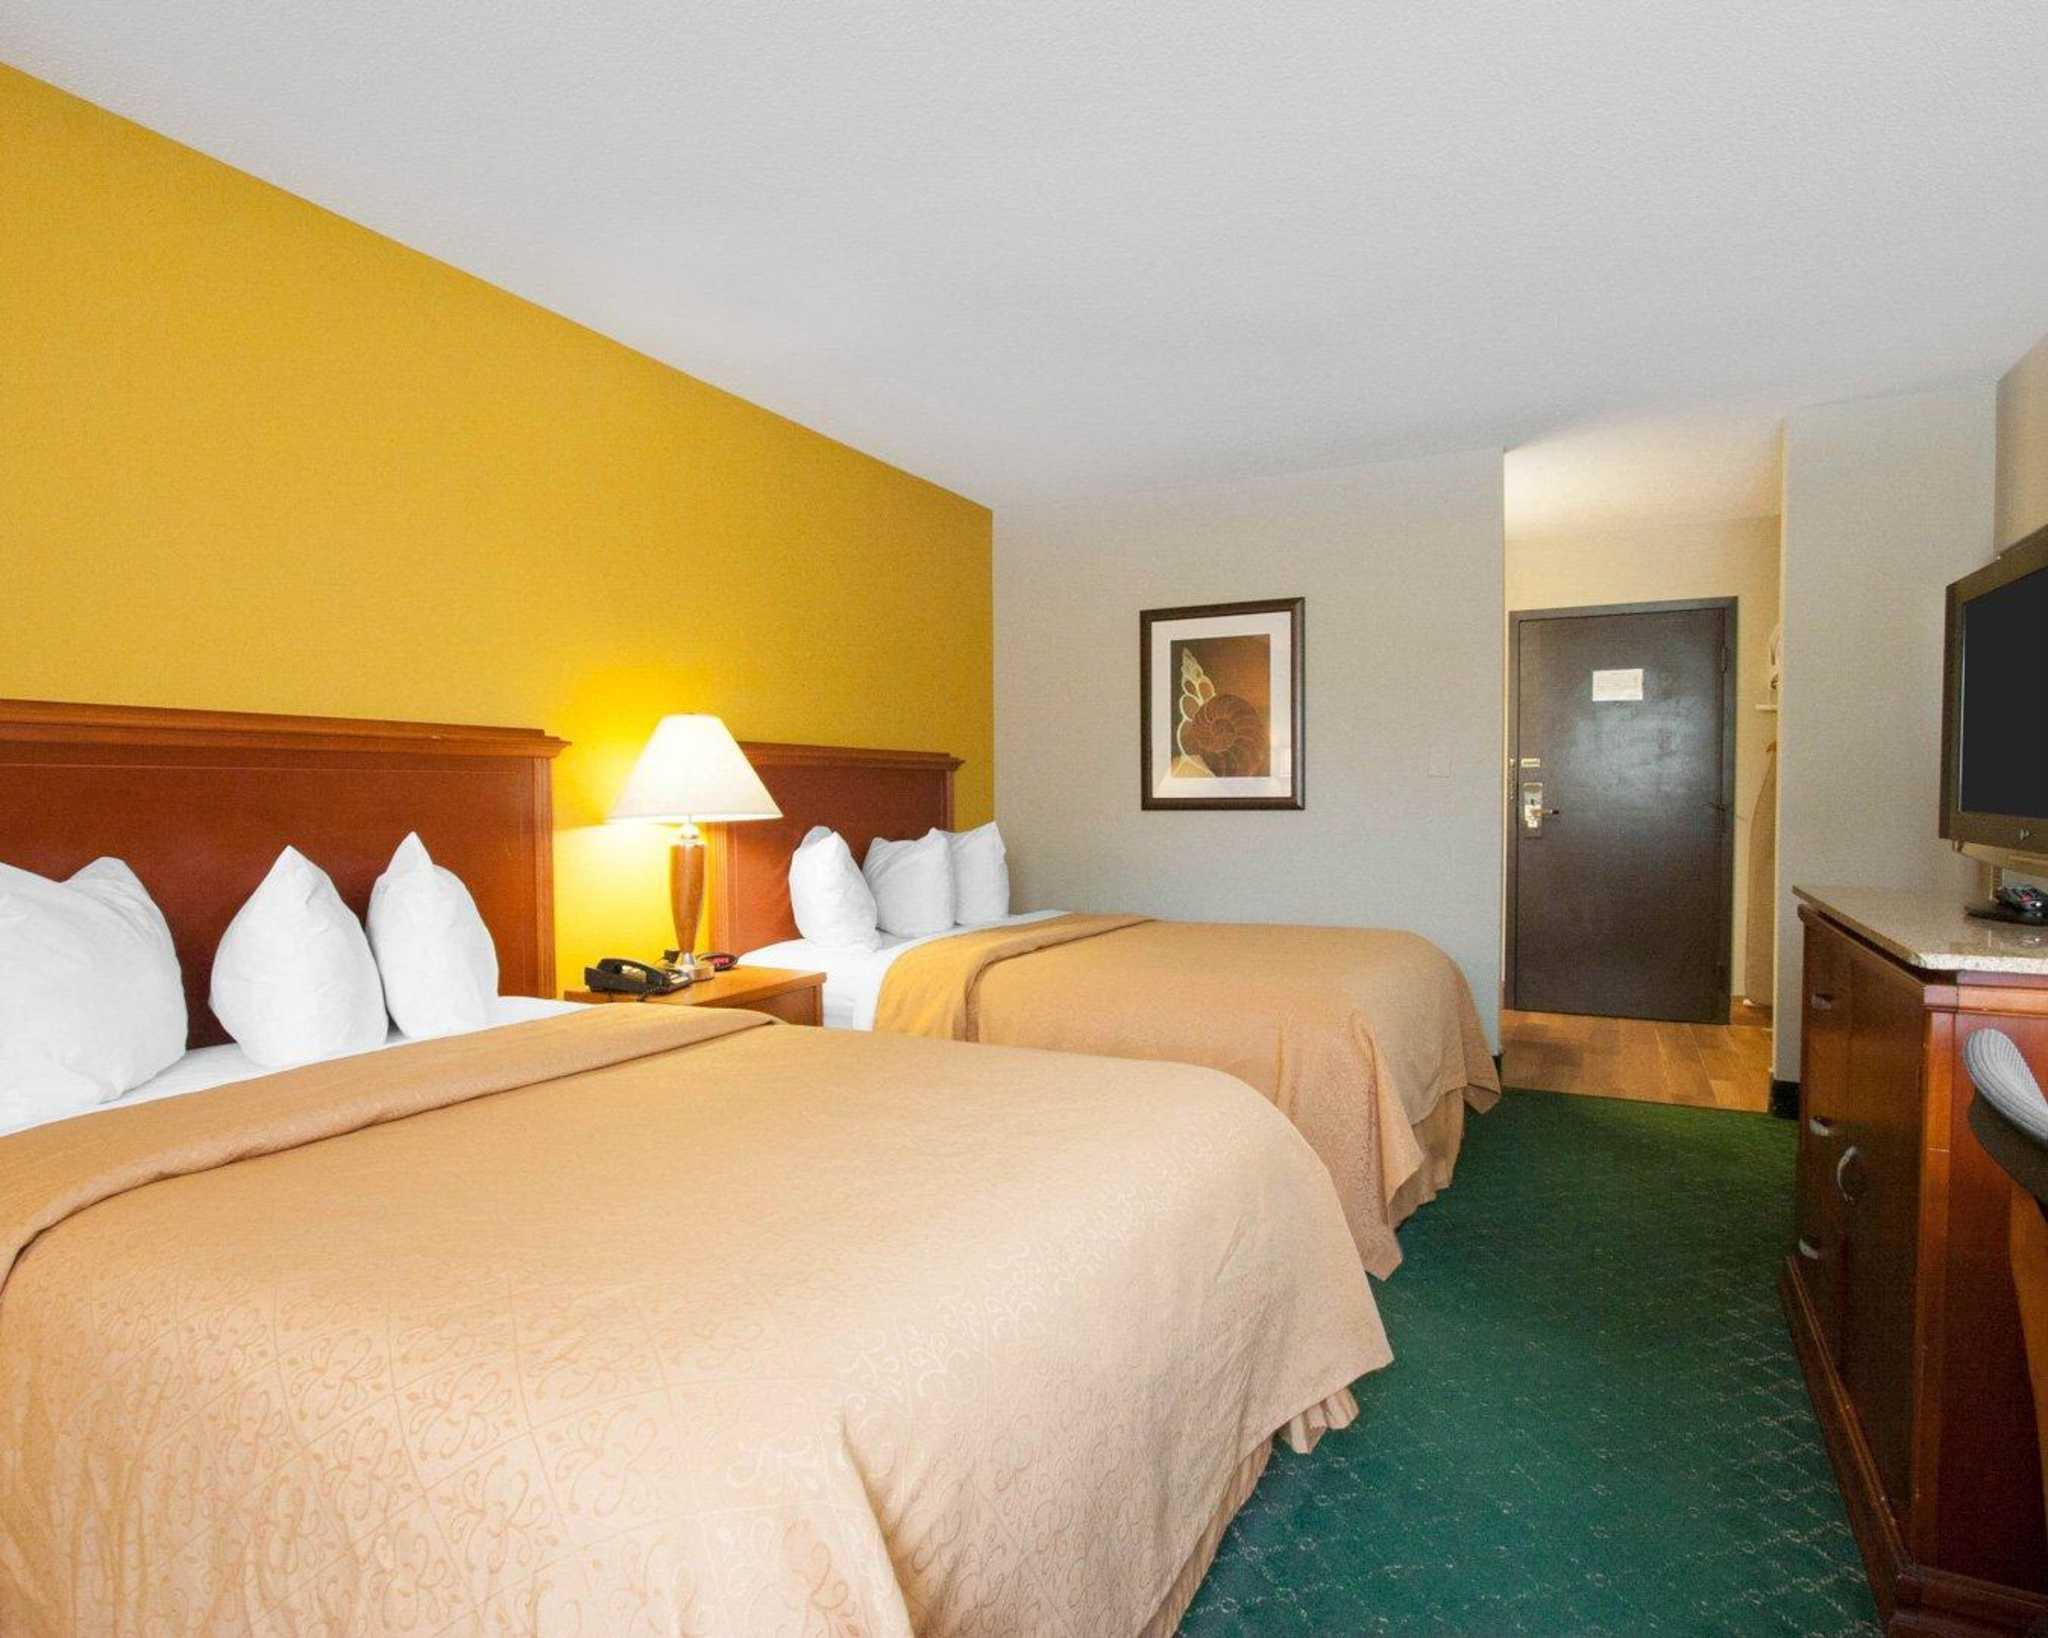 Quality Inn image 27